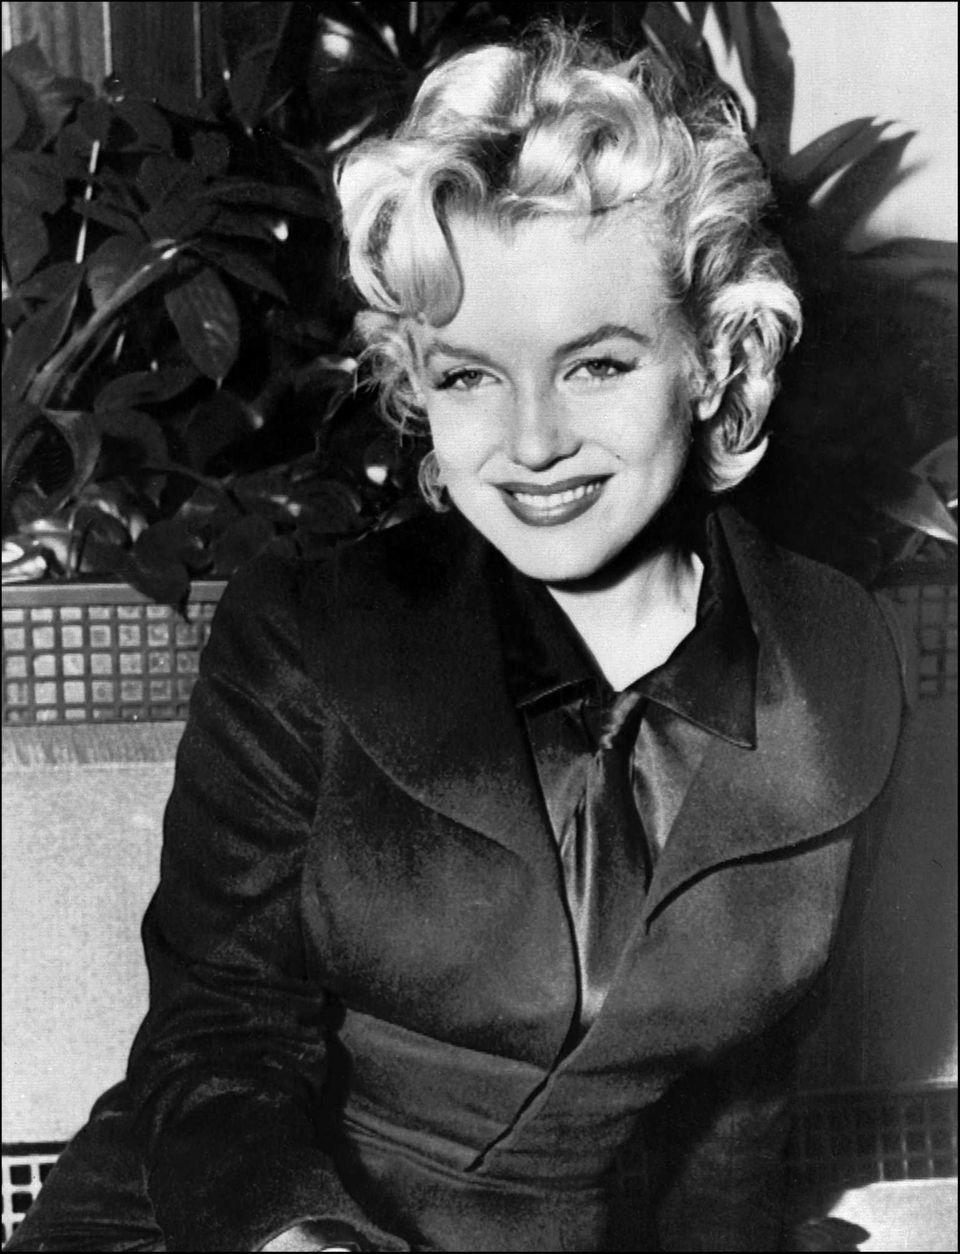 Marilyn Monroe was born on June 1, 1926.